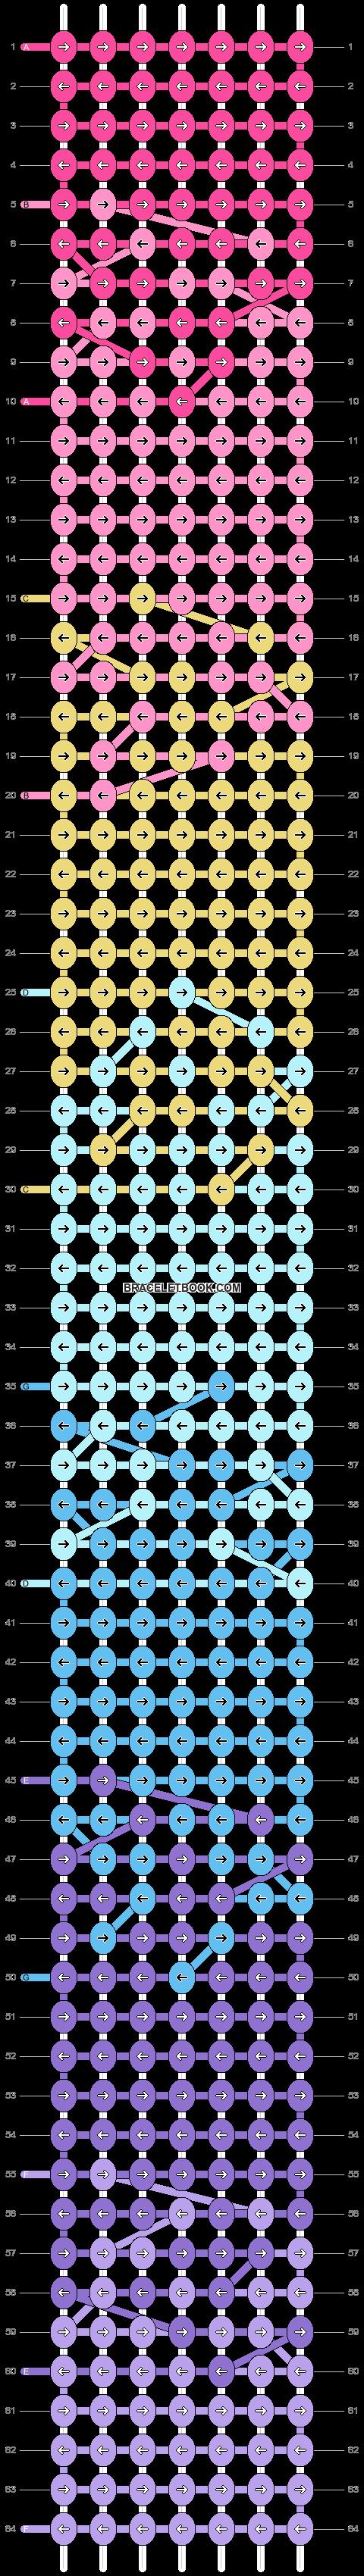 Alpha pattern #29051 pattern